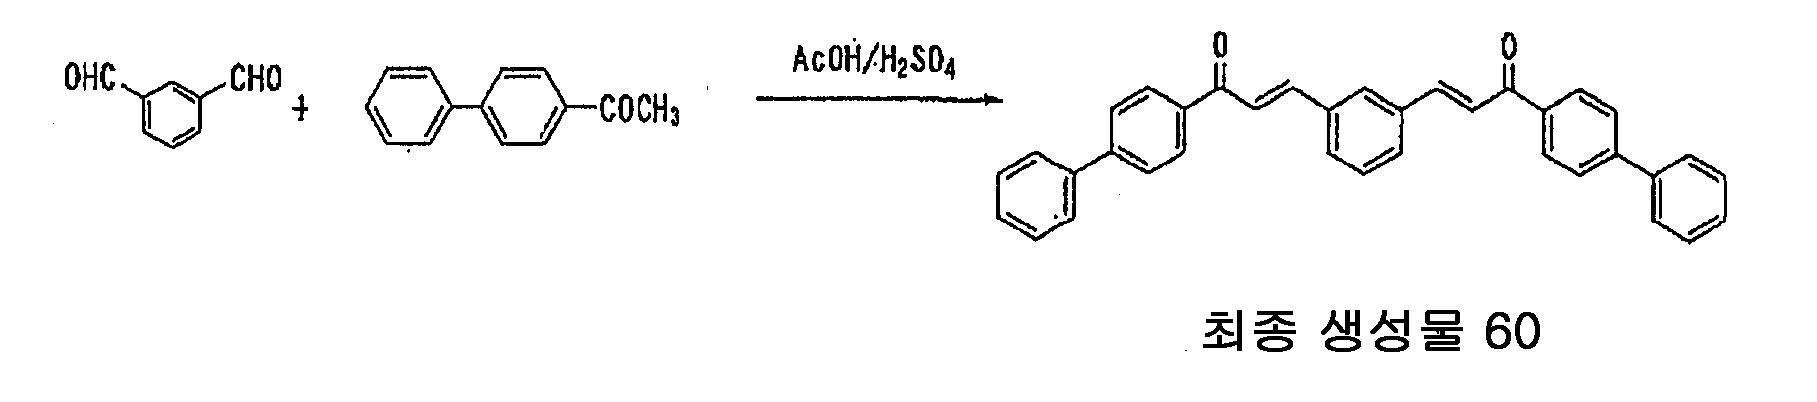 Figure 112010002231902-pat00148